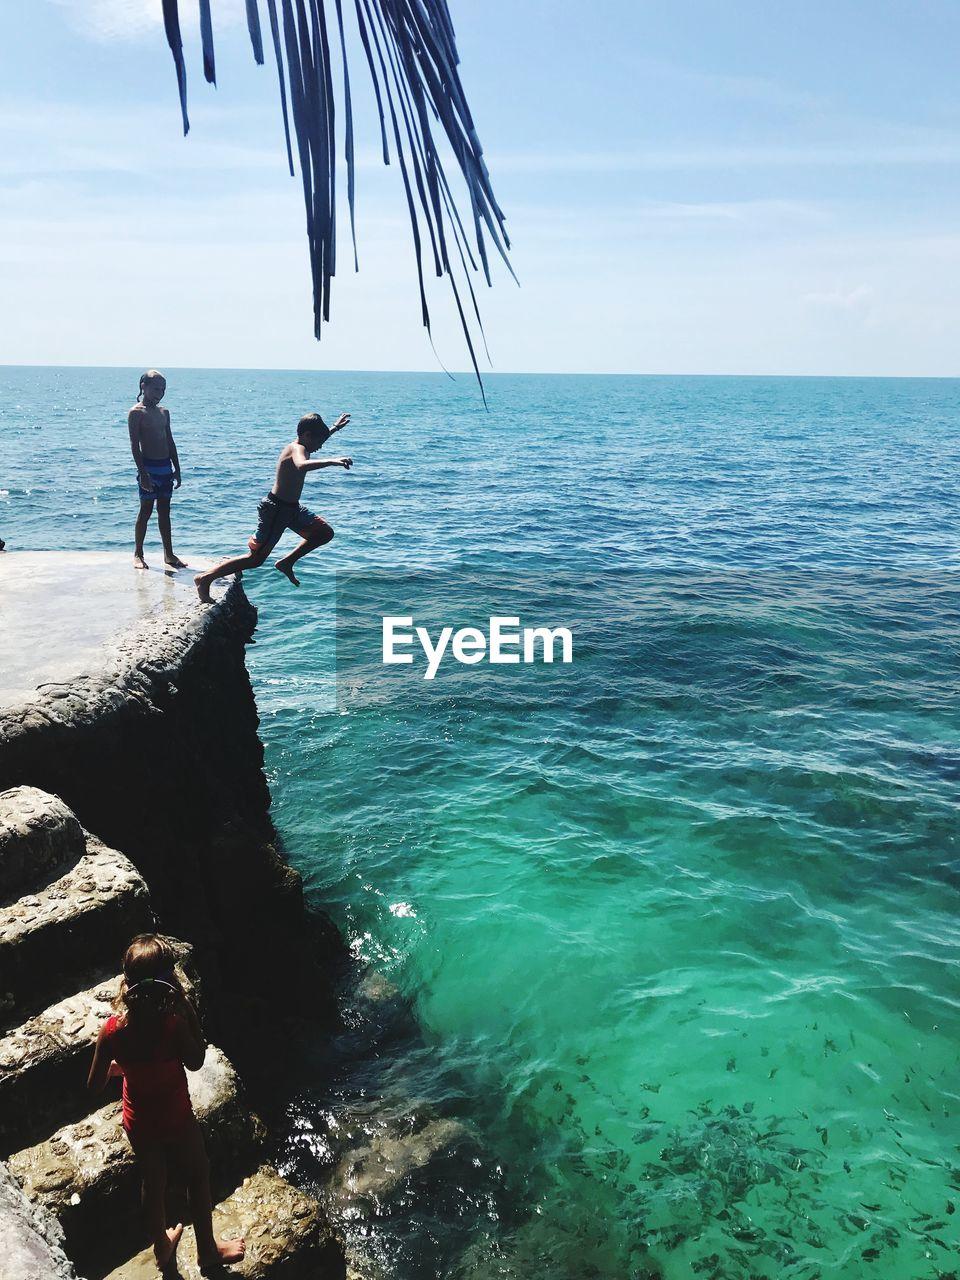 PEOPLE AT SEA AGAINST SKY